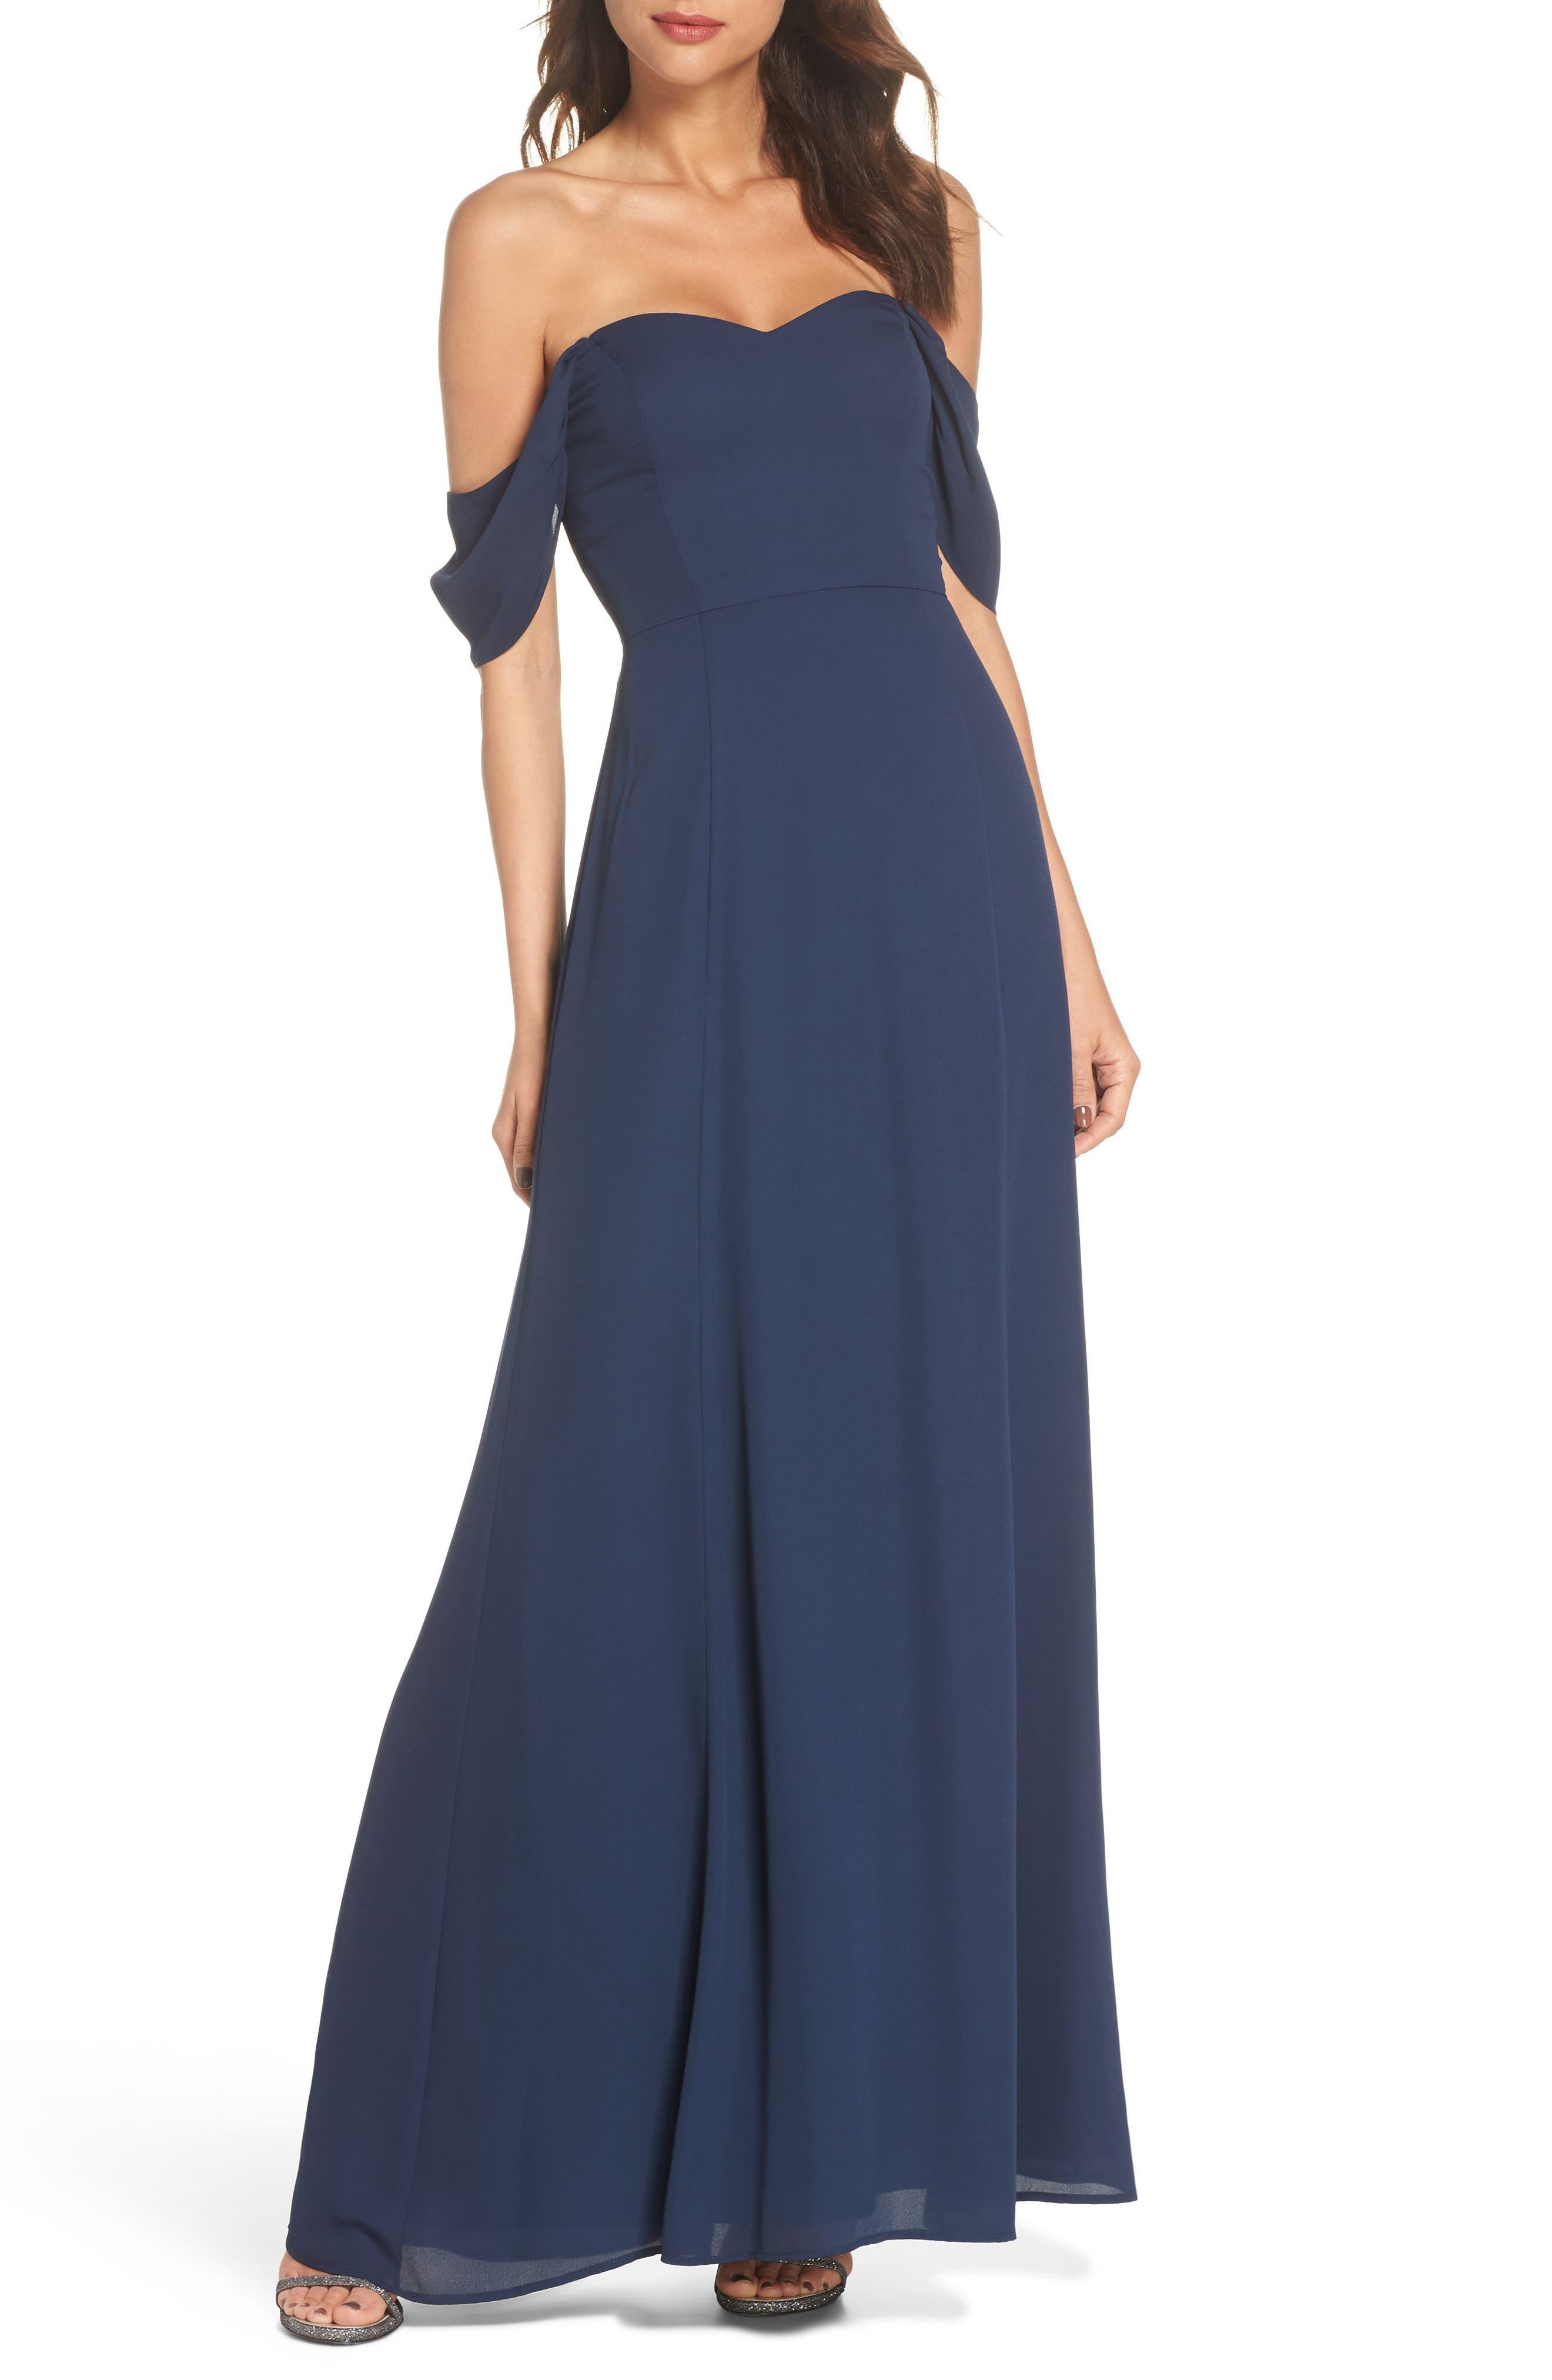 Rachel Off the Shoulder Gored Maxi Dress,                         Main,                         color,